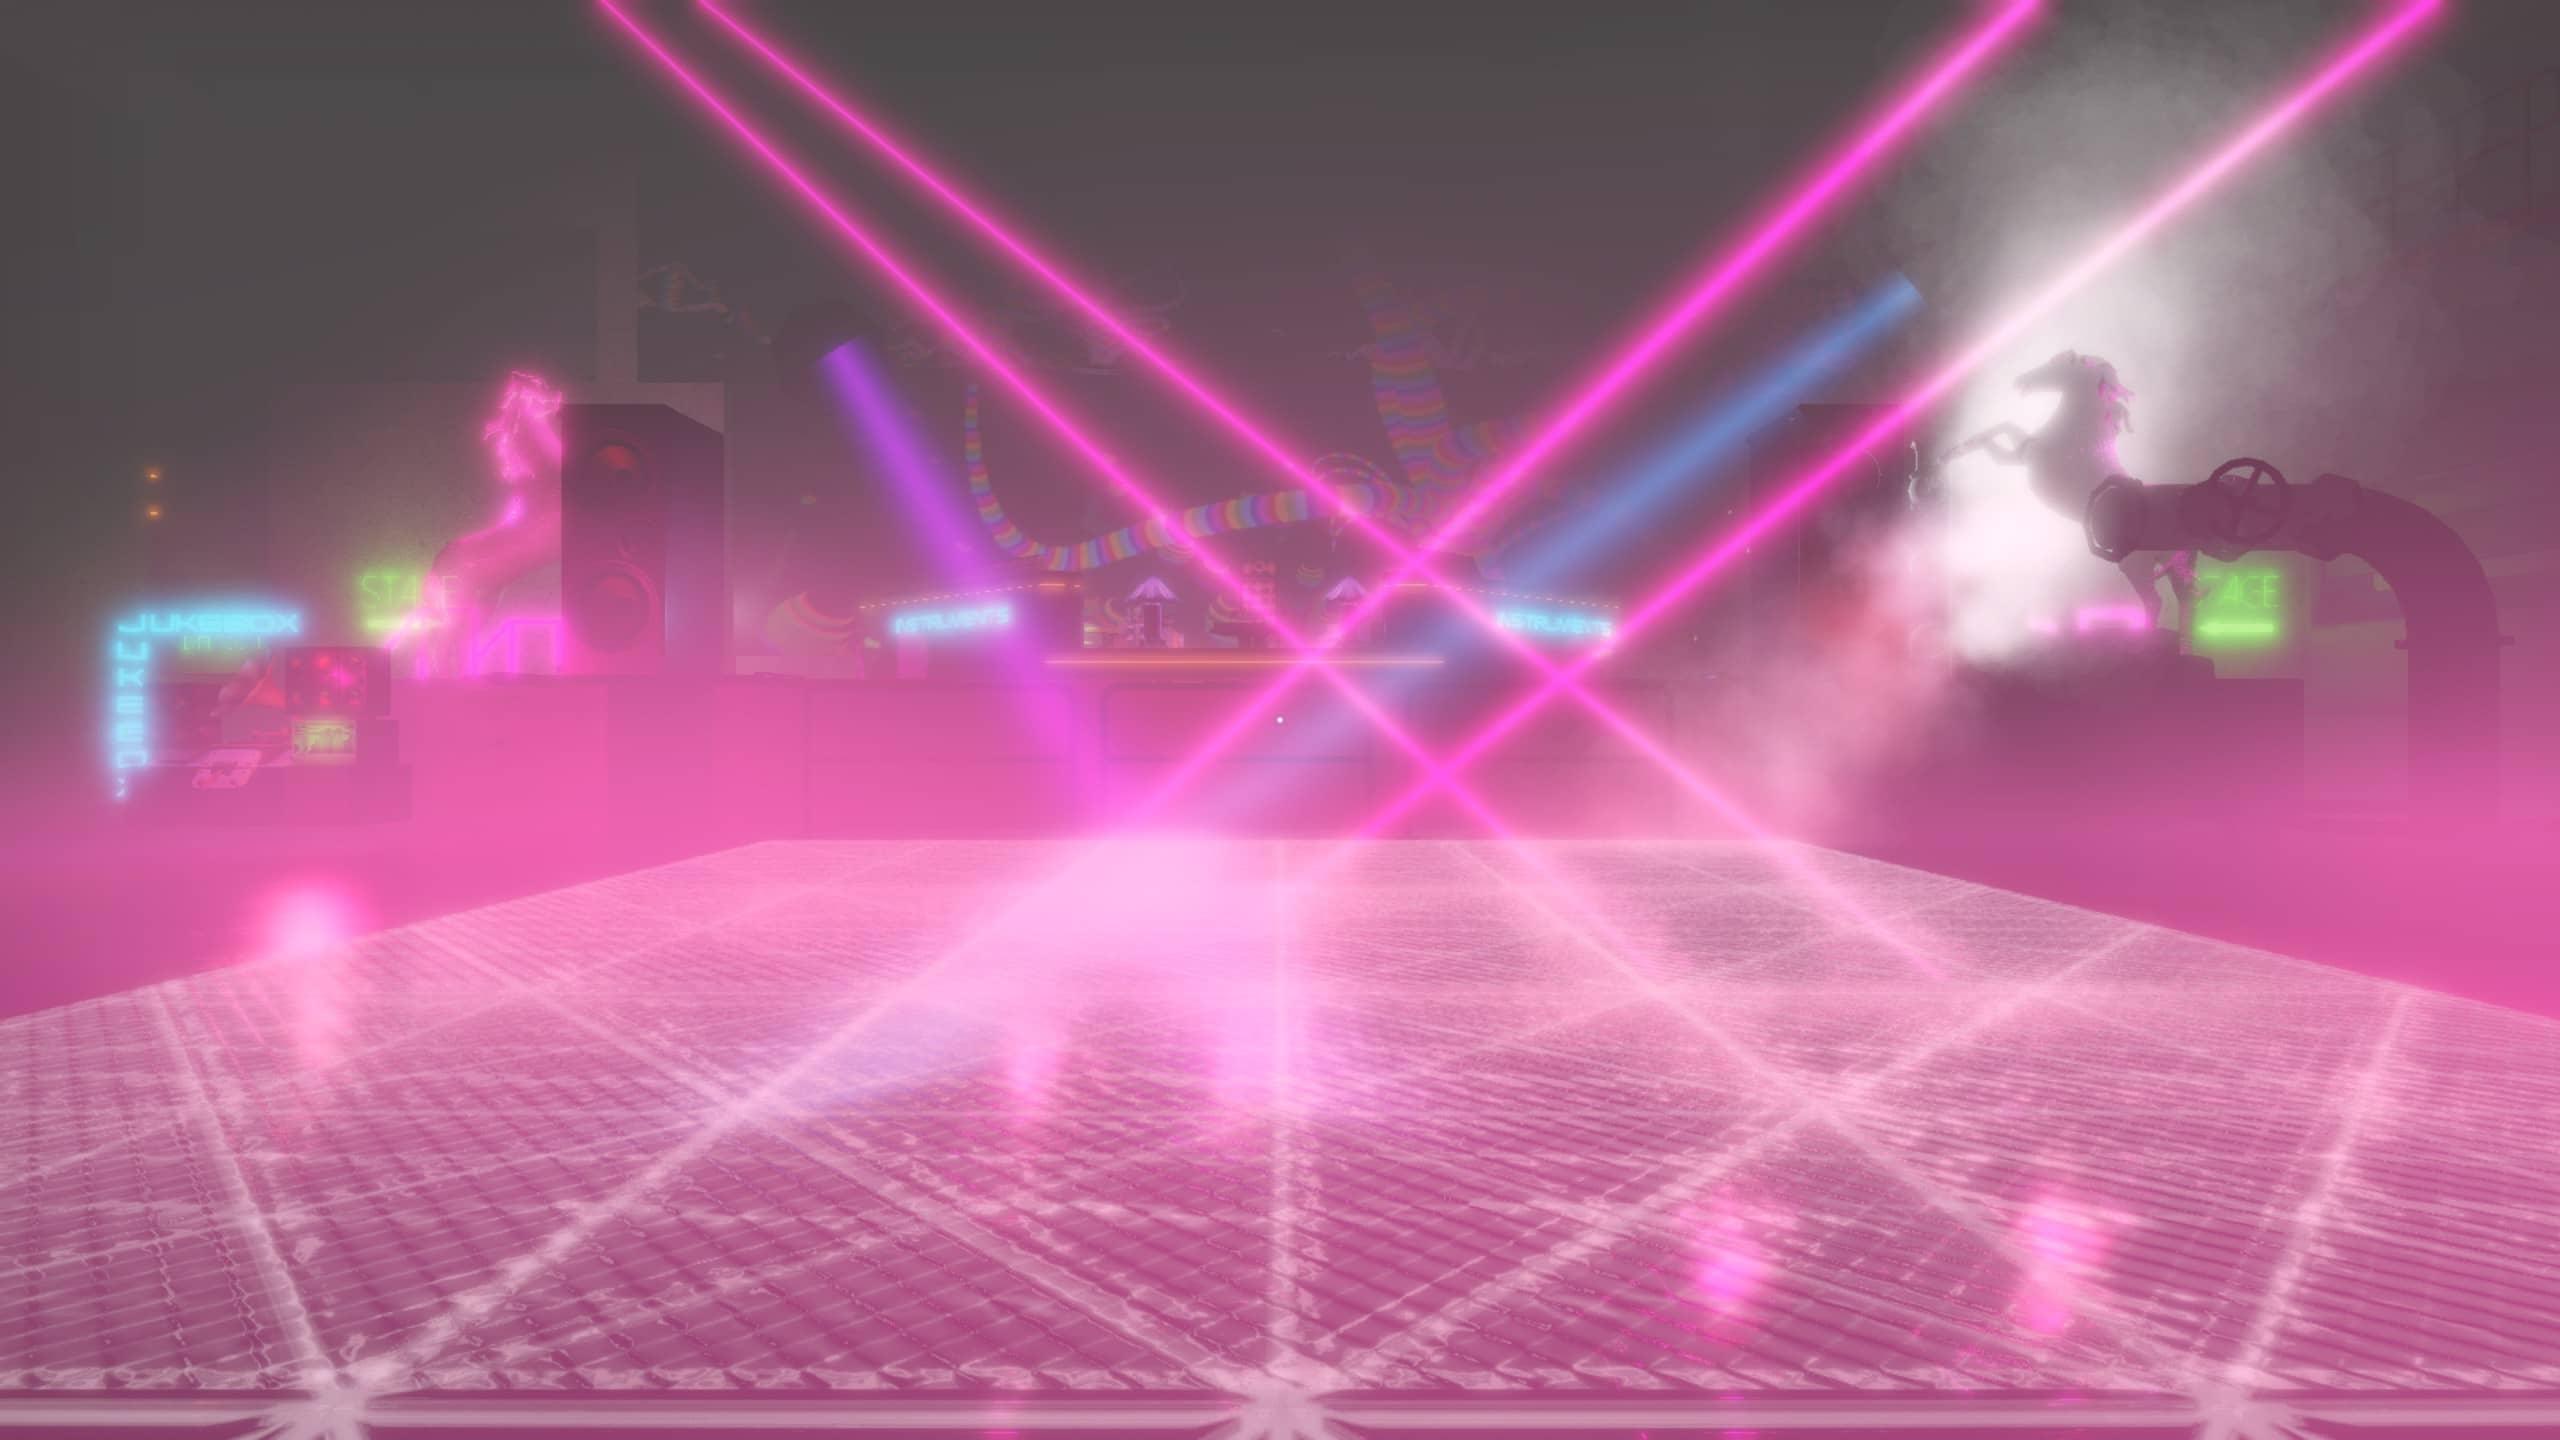 Isolationist Nightclub Simulator Review